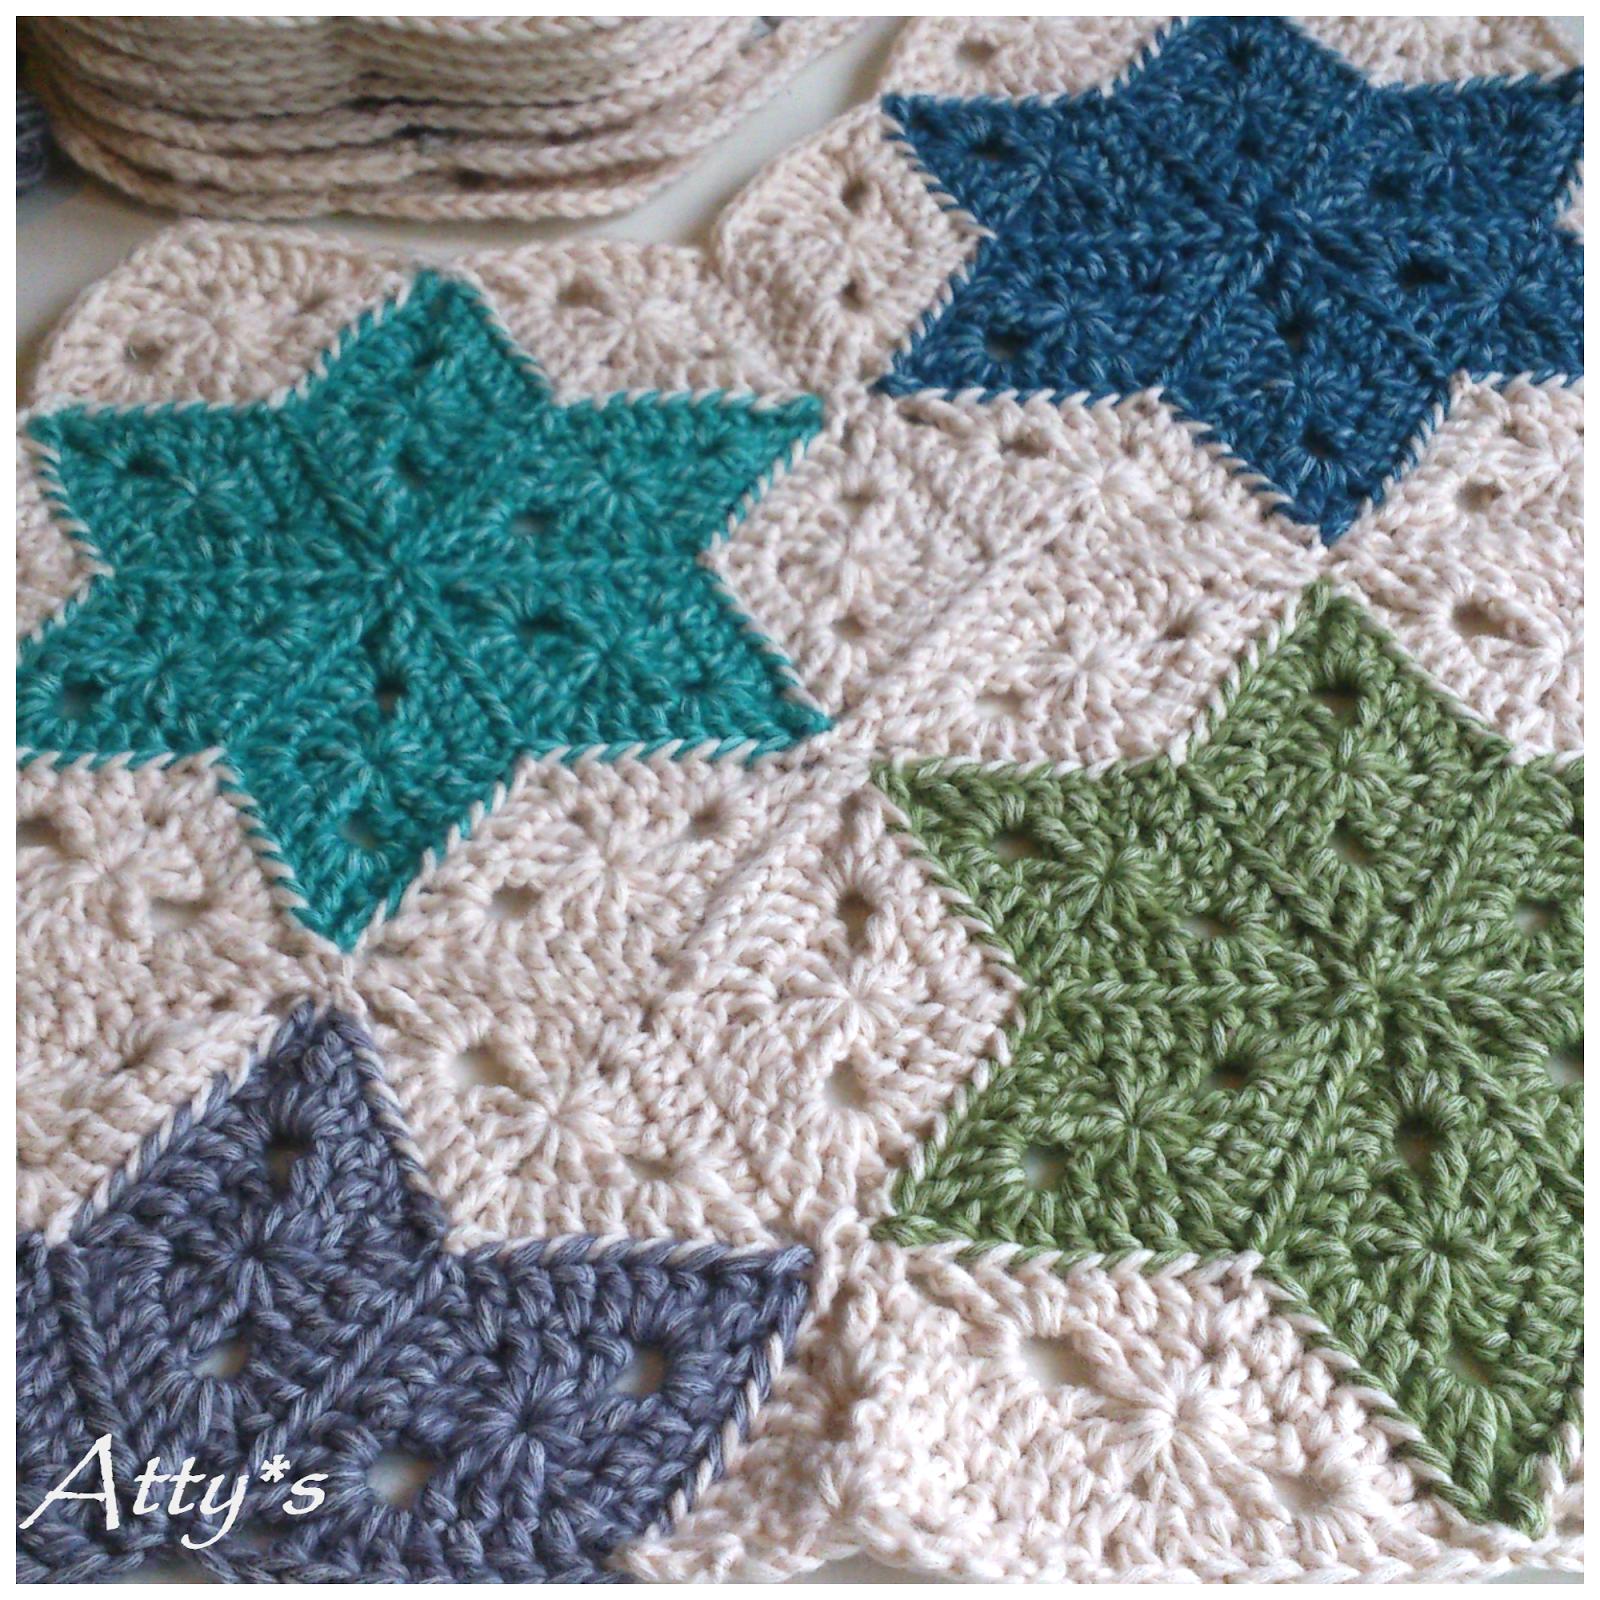 Crochet stonewashedxl star blanket httpsfacebookpages crochet stonewashedxl star blanket httpsfacebookpages bankloansurffo Image collections